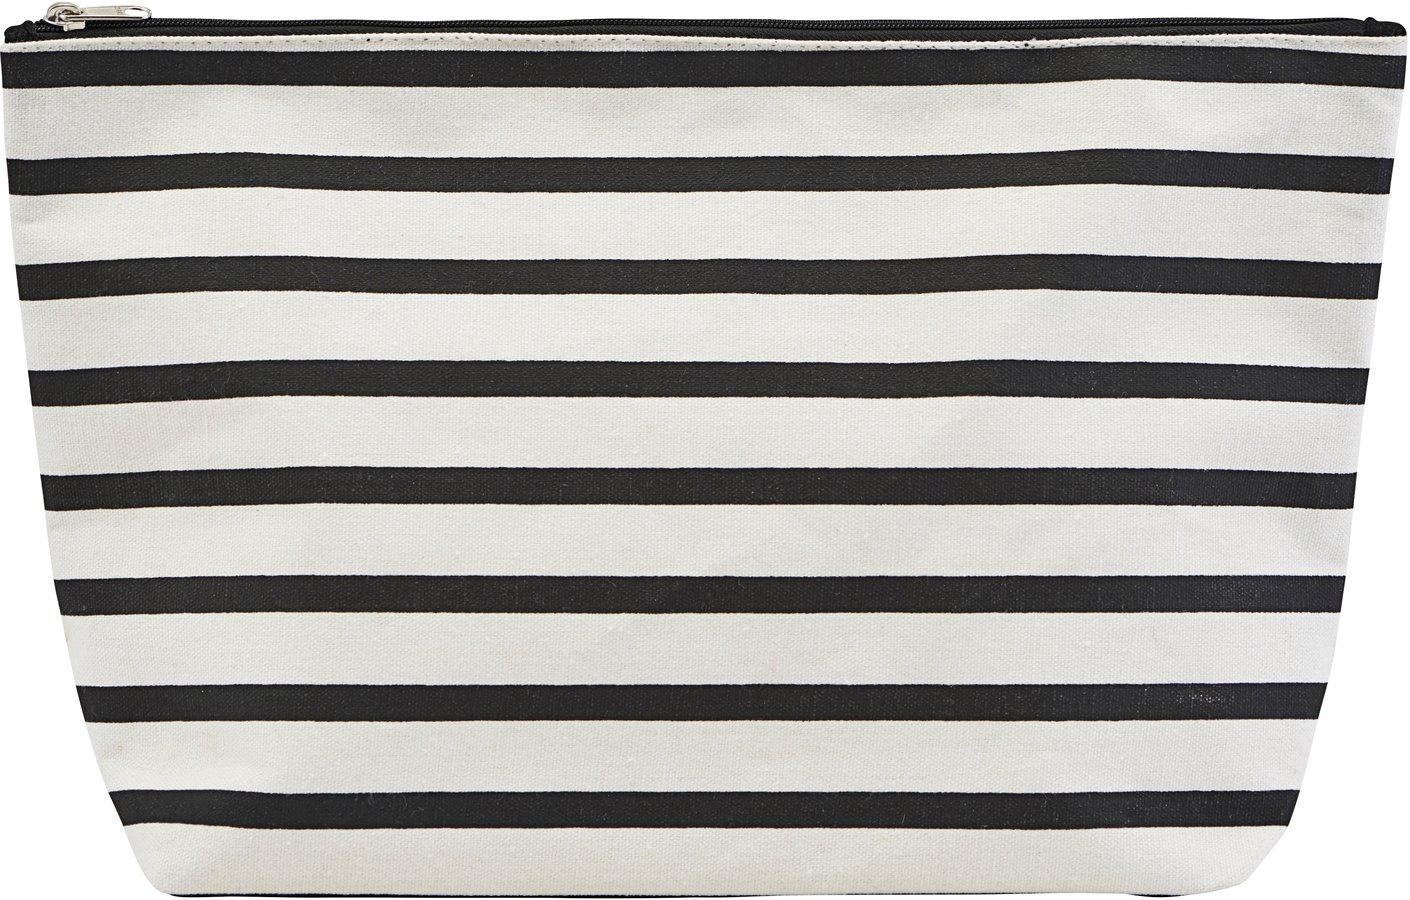 Toilettaske, Stripes by House Doctor (H: 20 cm. B: 8 cm. L: 32 cm., Sort/Hvid)